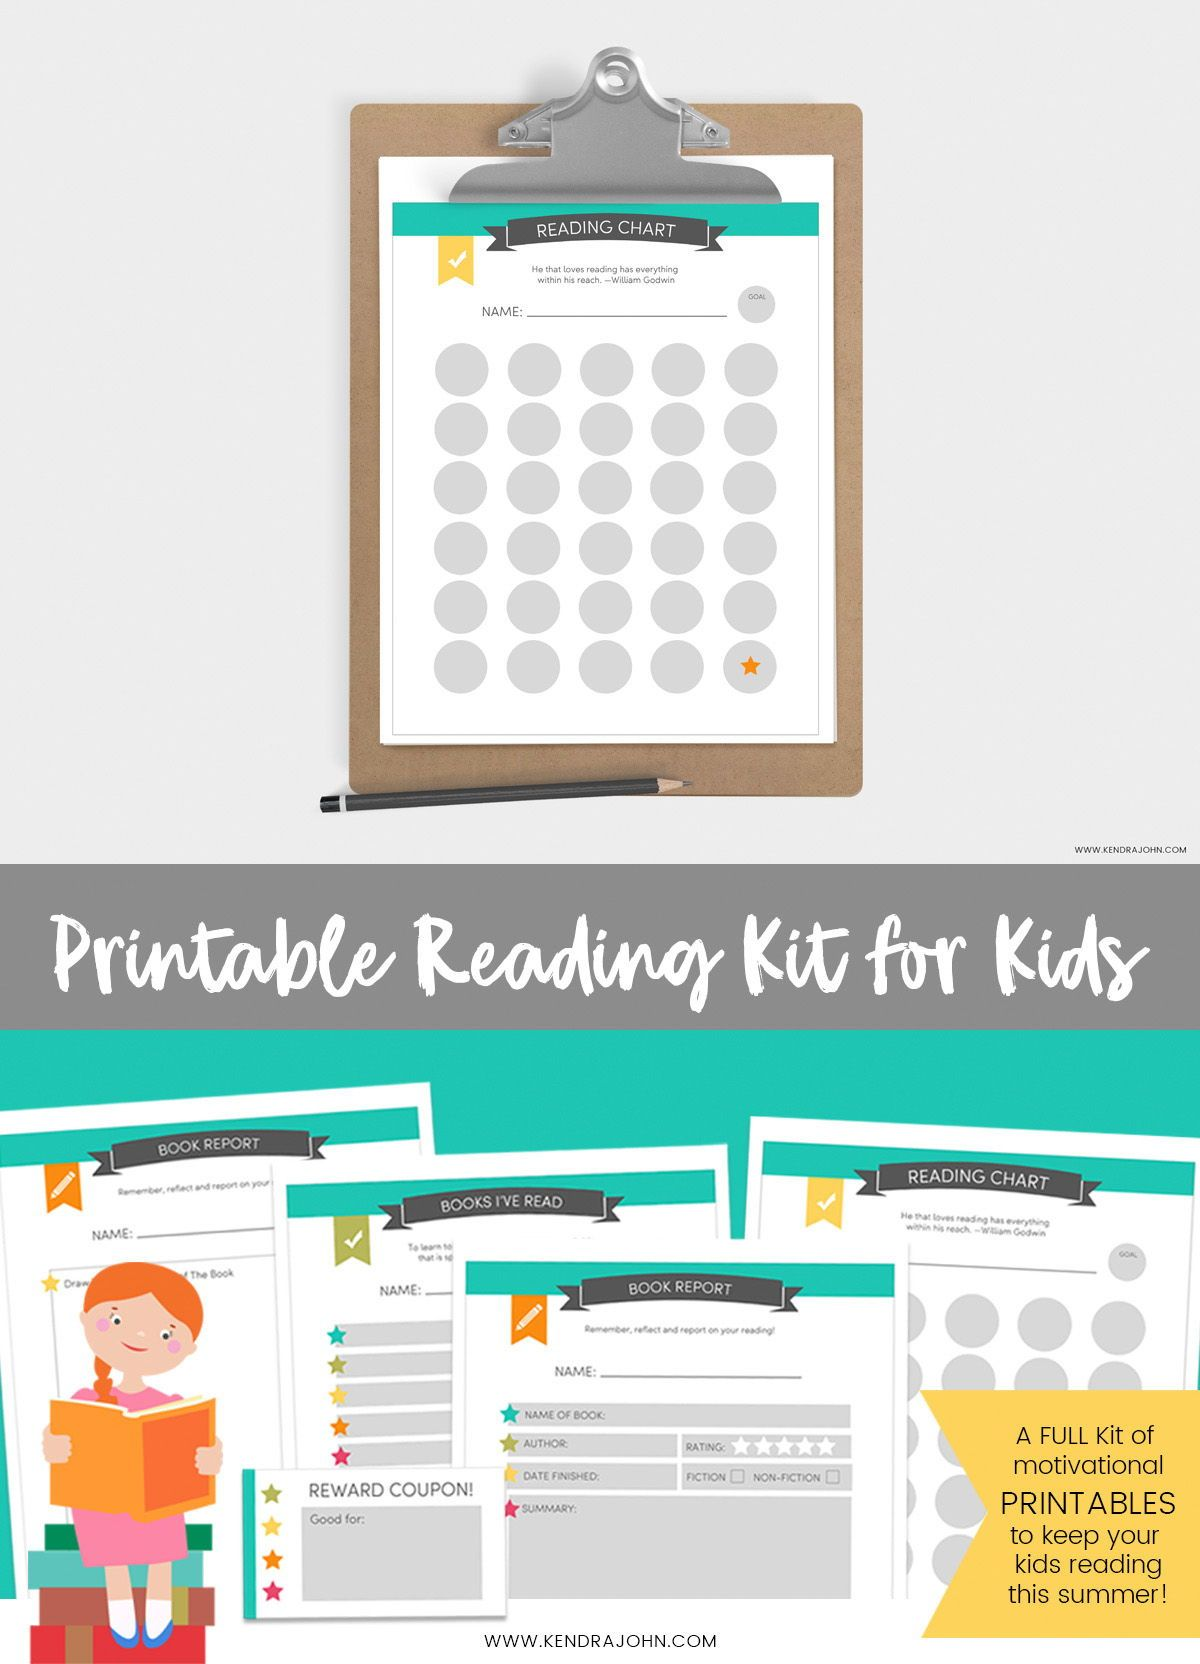 Printable Reading Kit For Kids Freeprintable